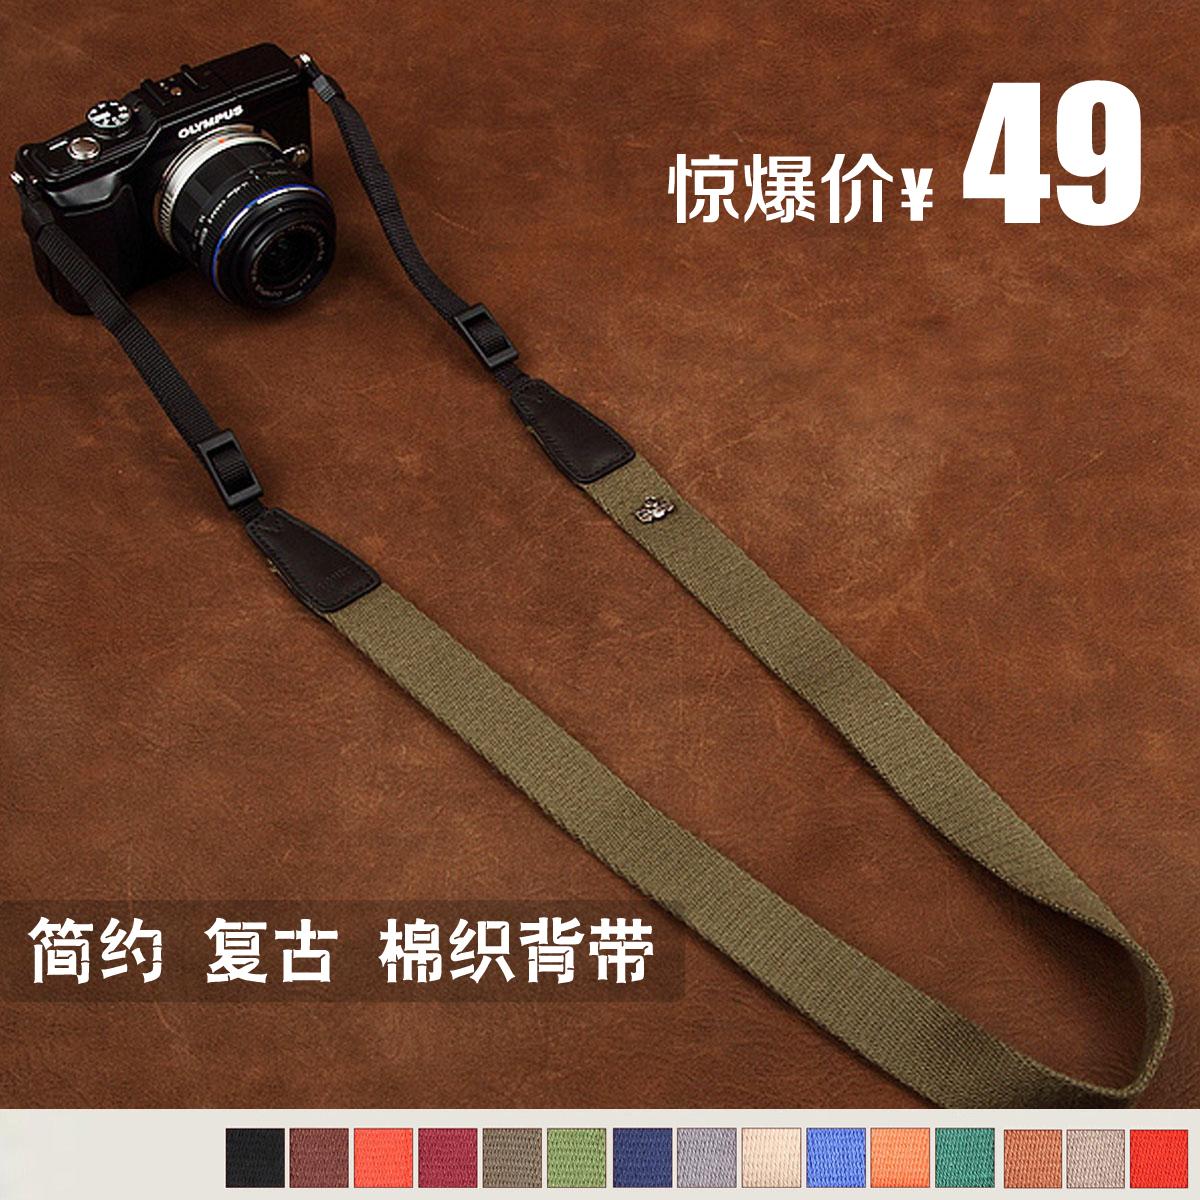 cam-in  棉织圆孔相机背带尼龙摄影肩带减压复古单反微单 宽2.5CM